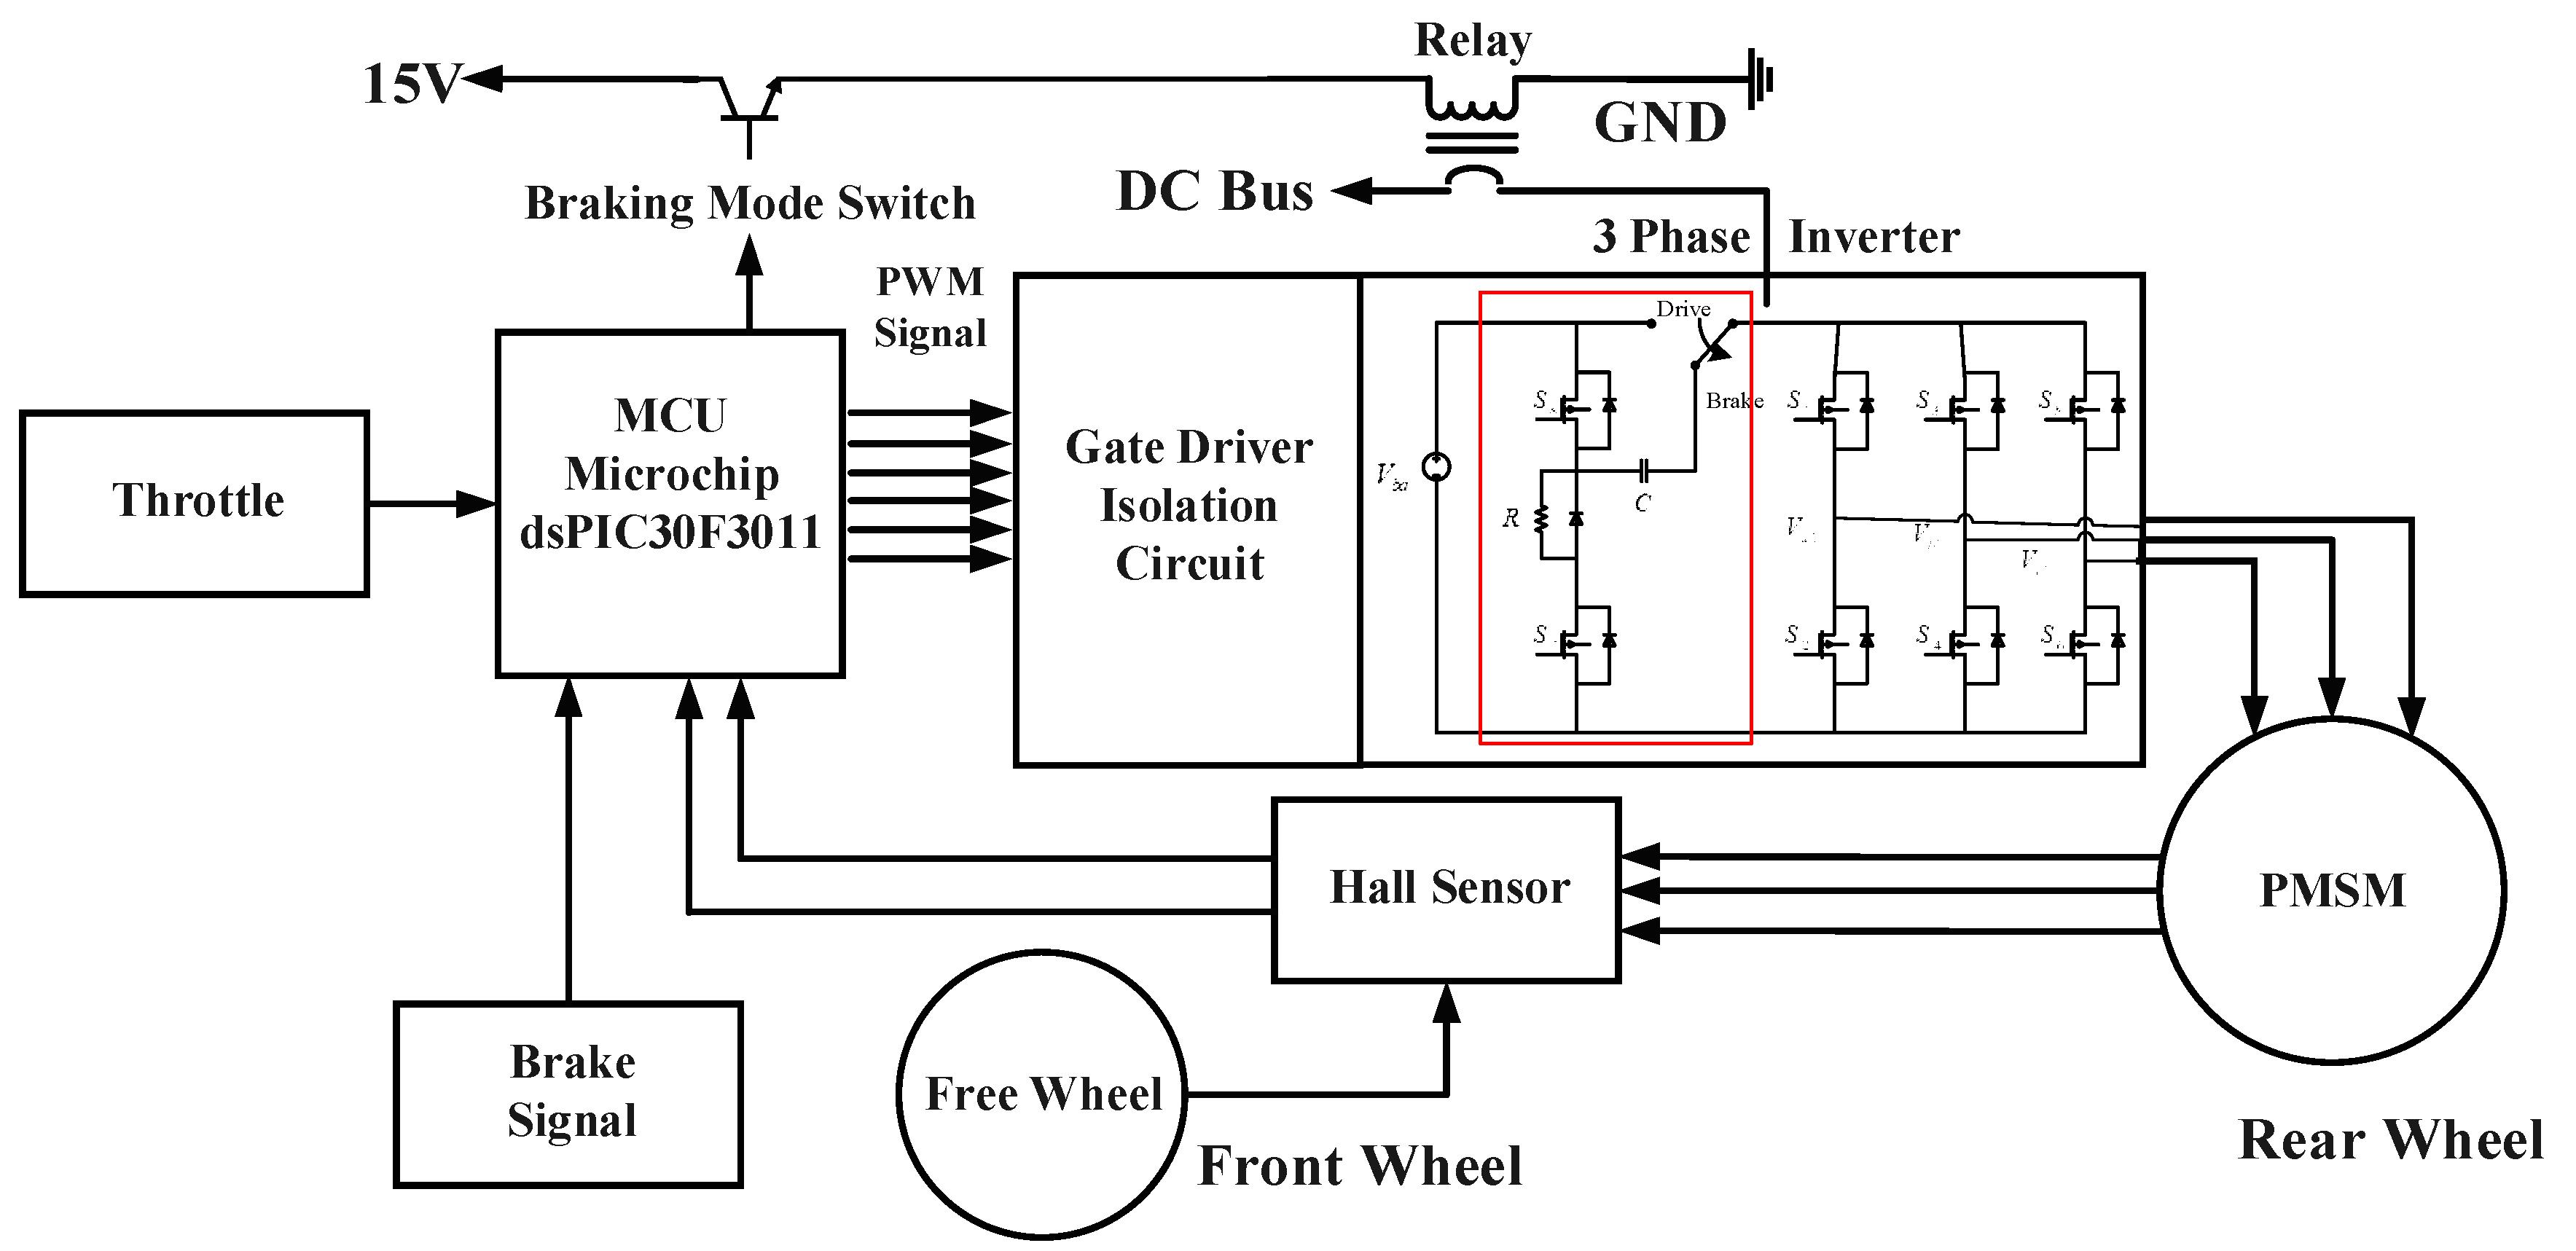 Regenerative Braking Circuit Diagram | Actuators Free Full Text Active Control Of Regenerative Brake